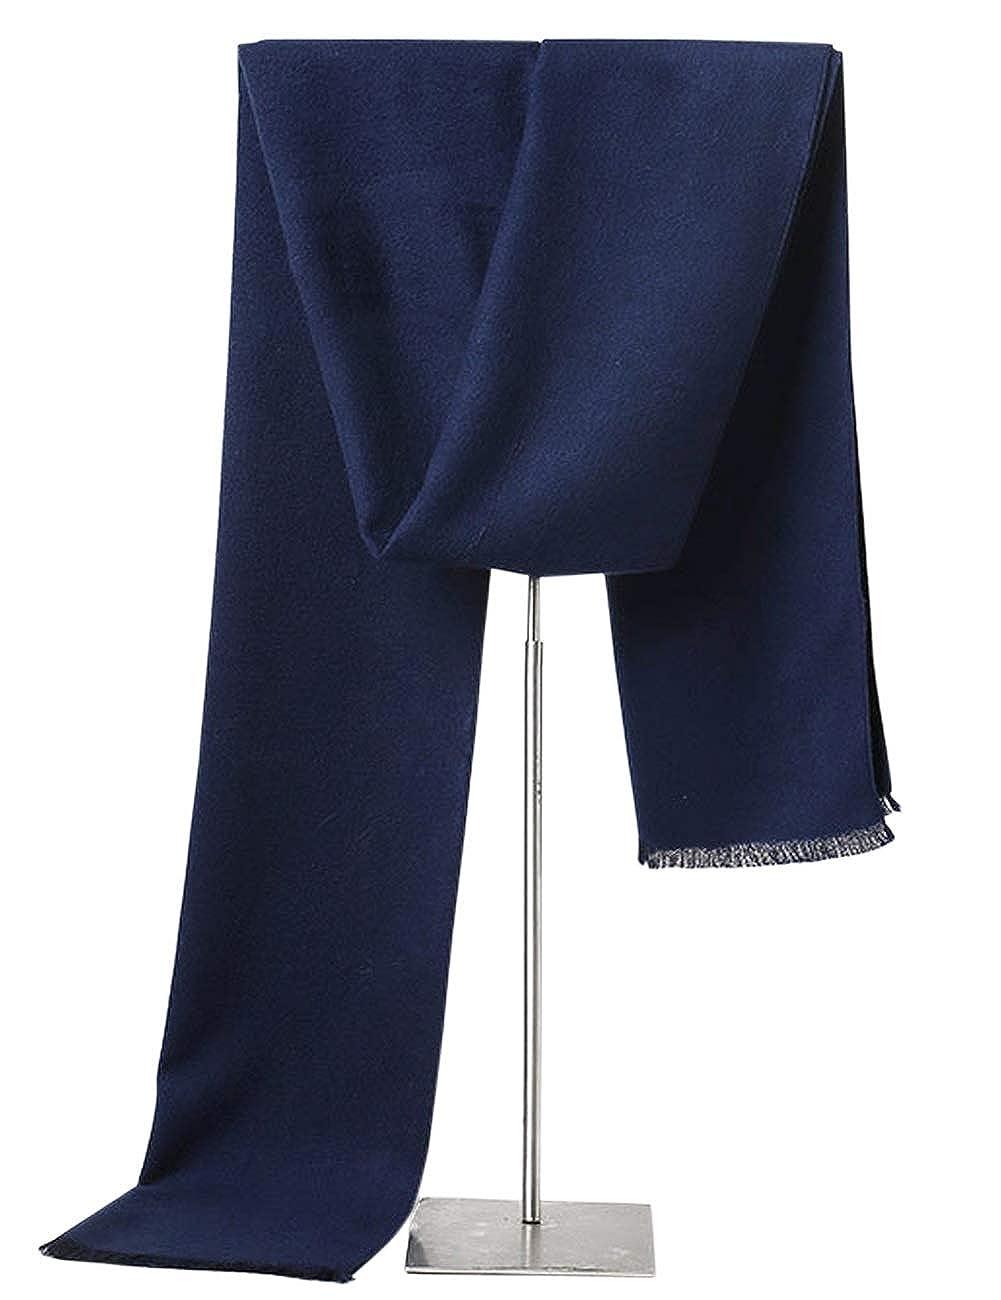 KAMA BRIDAL Men's Winter Scarf Long Plaid Cashmere Stripes Warm Soft Scarves ZHN-114792-Black